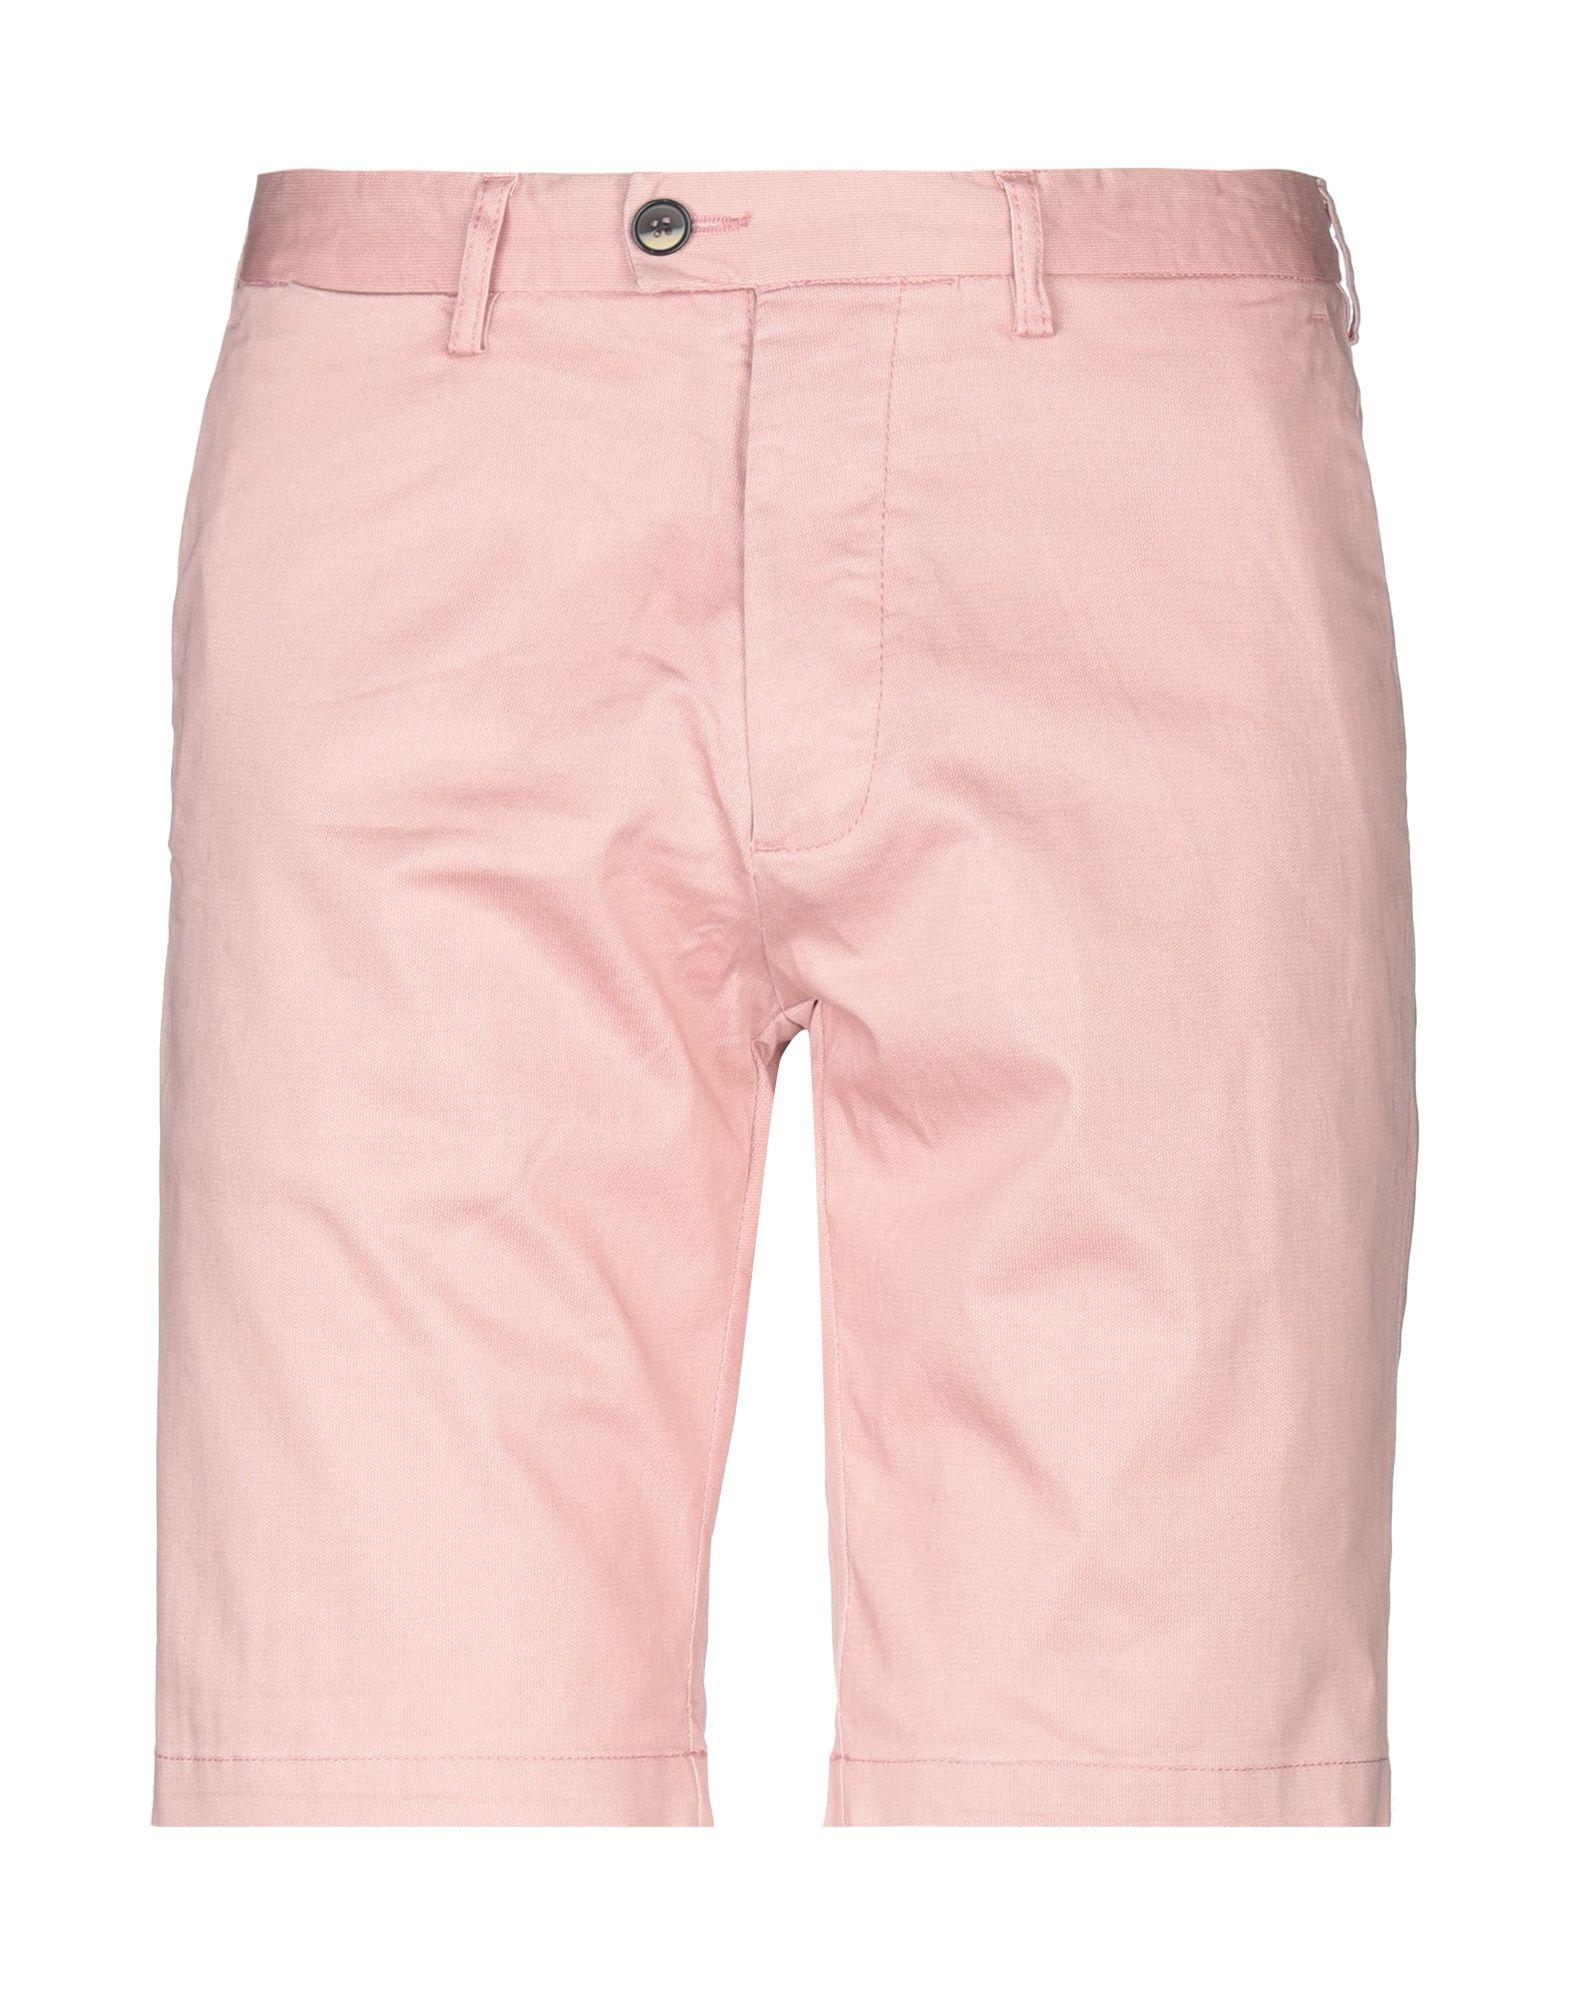 ALLEY DOCKS 963 Бермуды alley docks 963 джинсовая рубашка